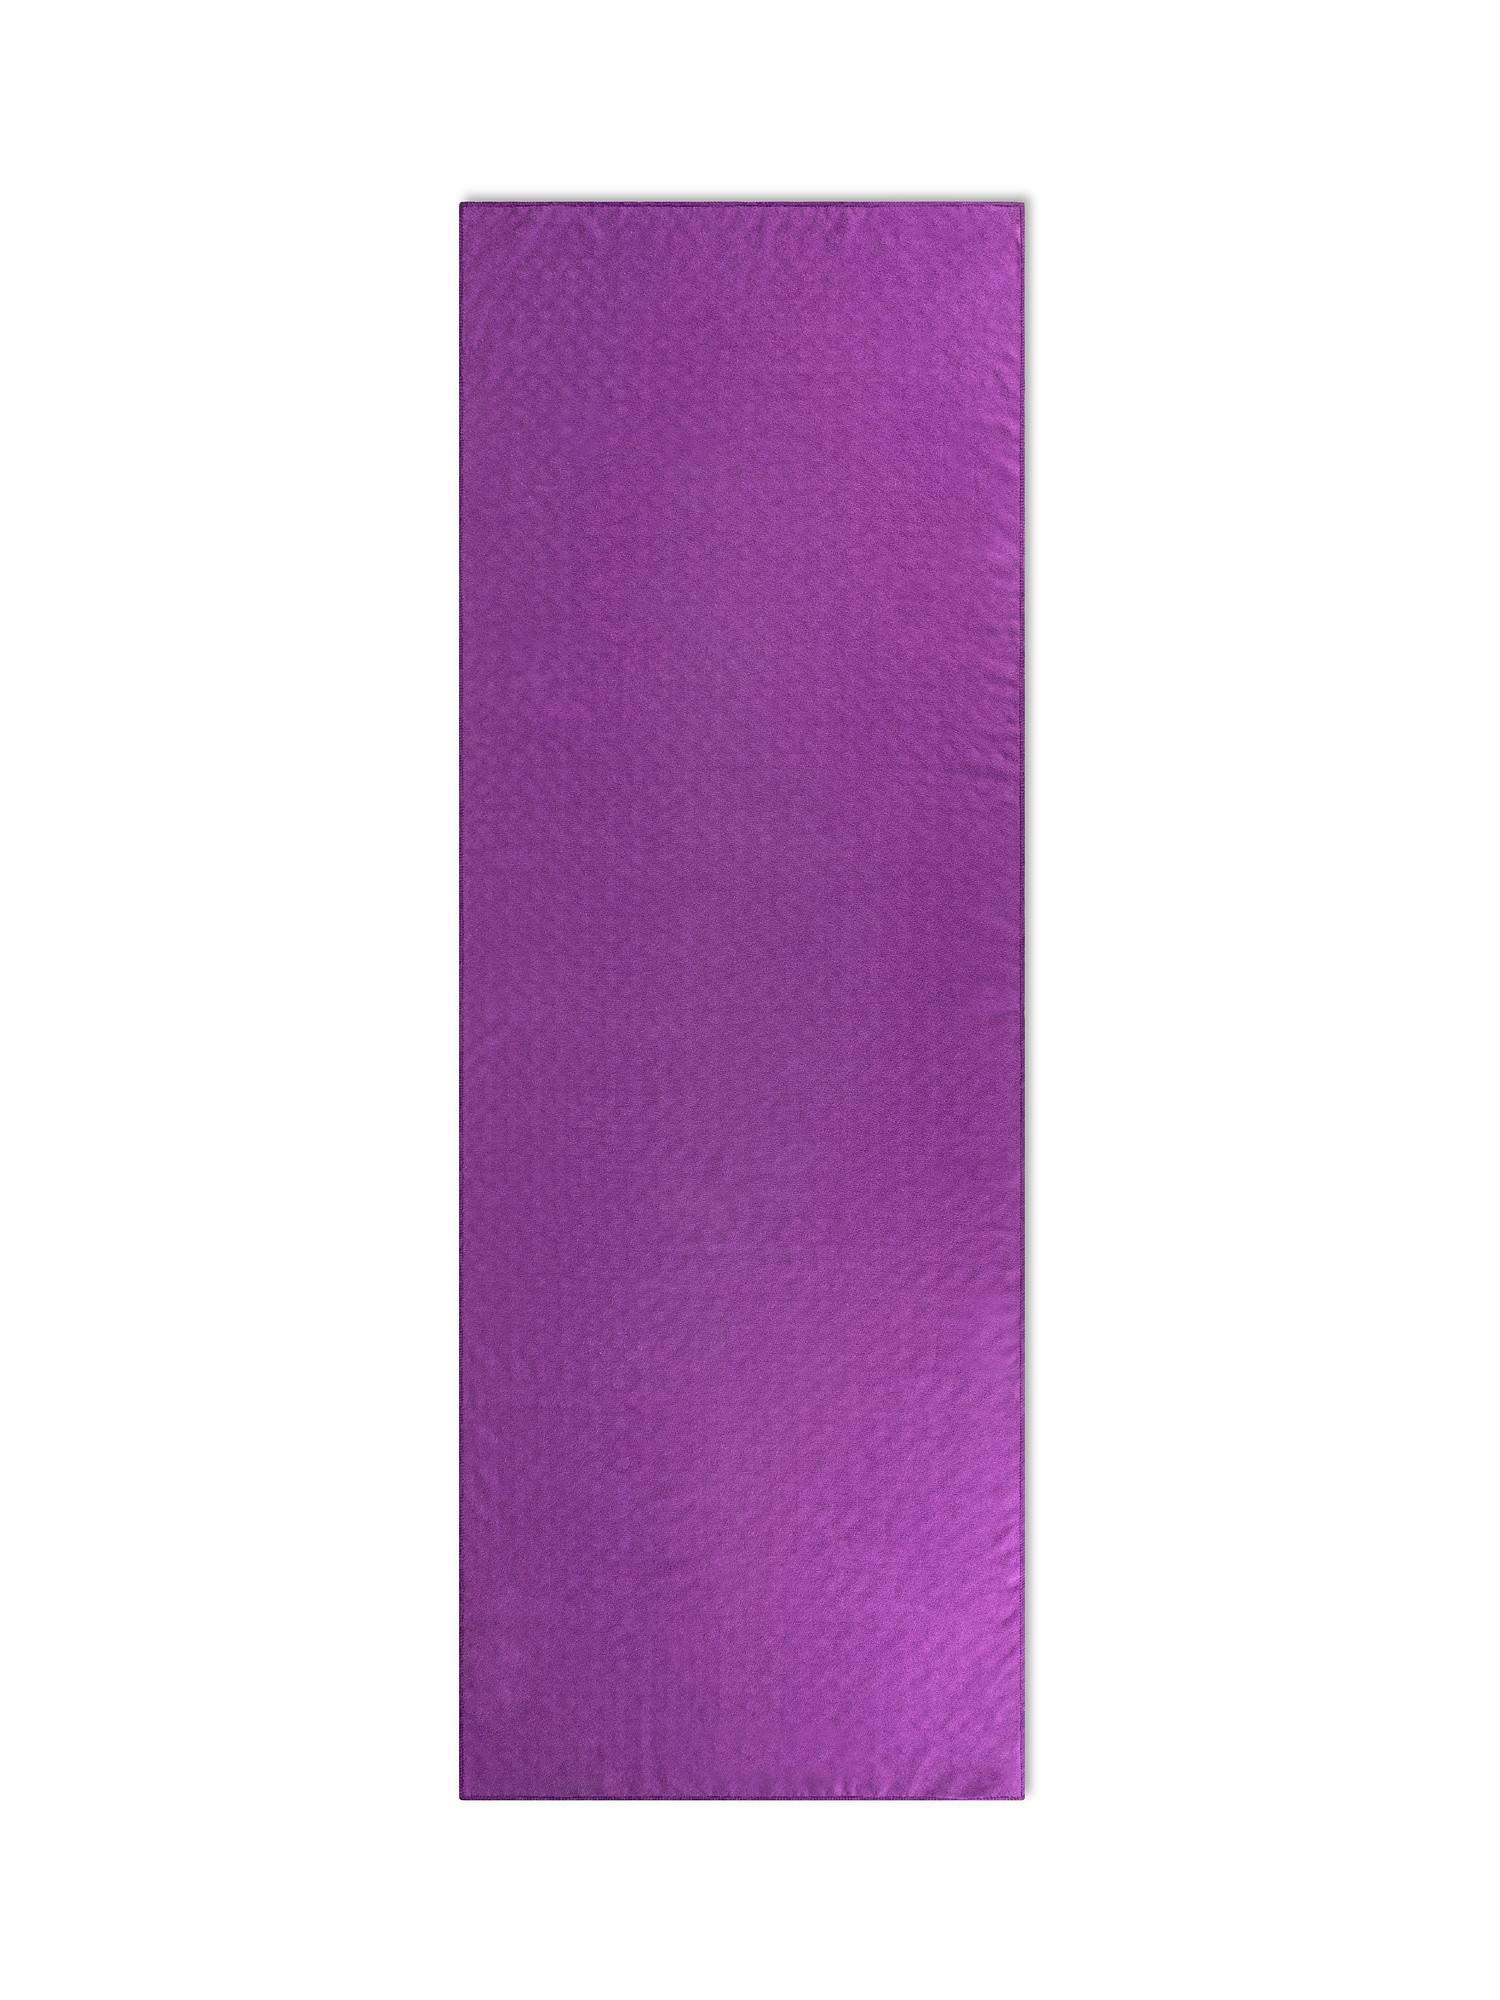 Telo yoga in microfibra tinta unita, Viola, large image number 1